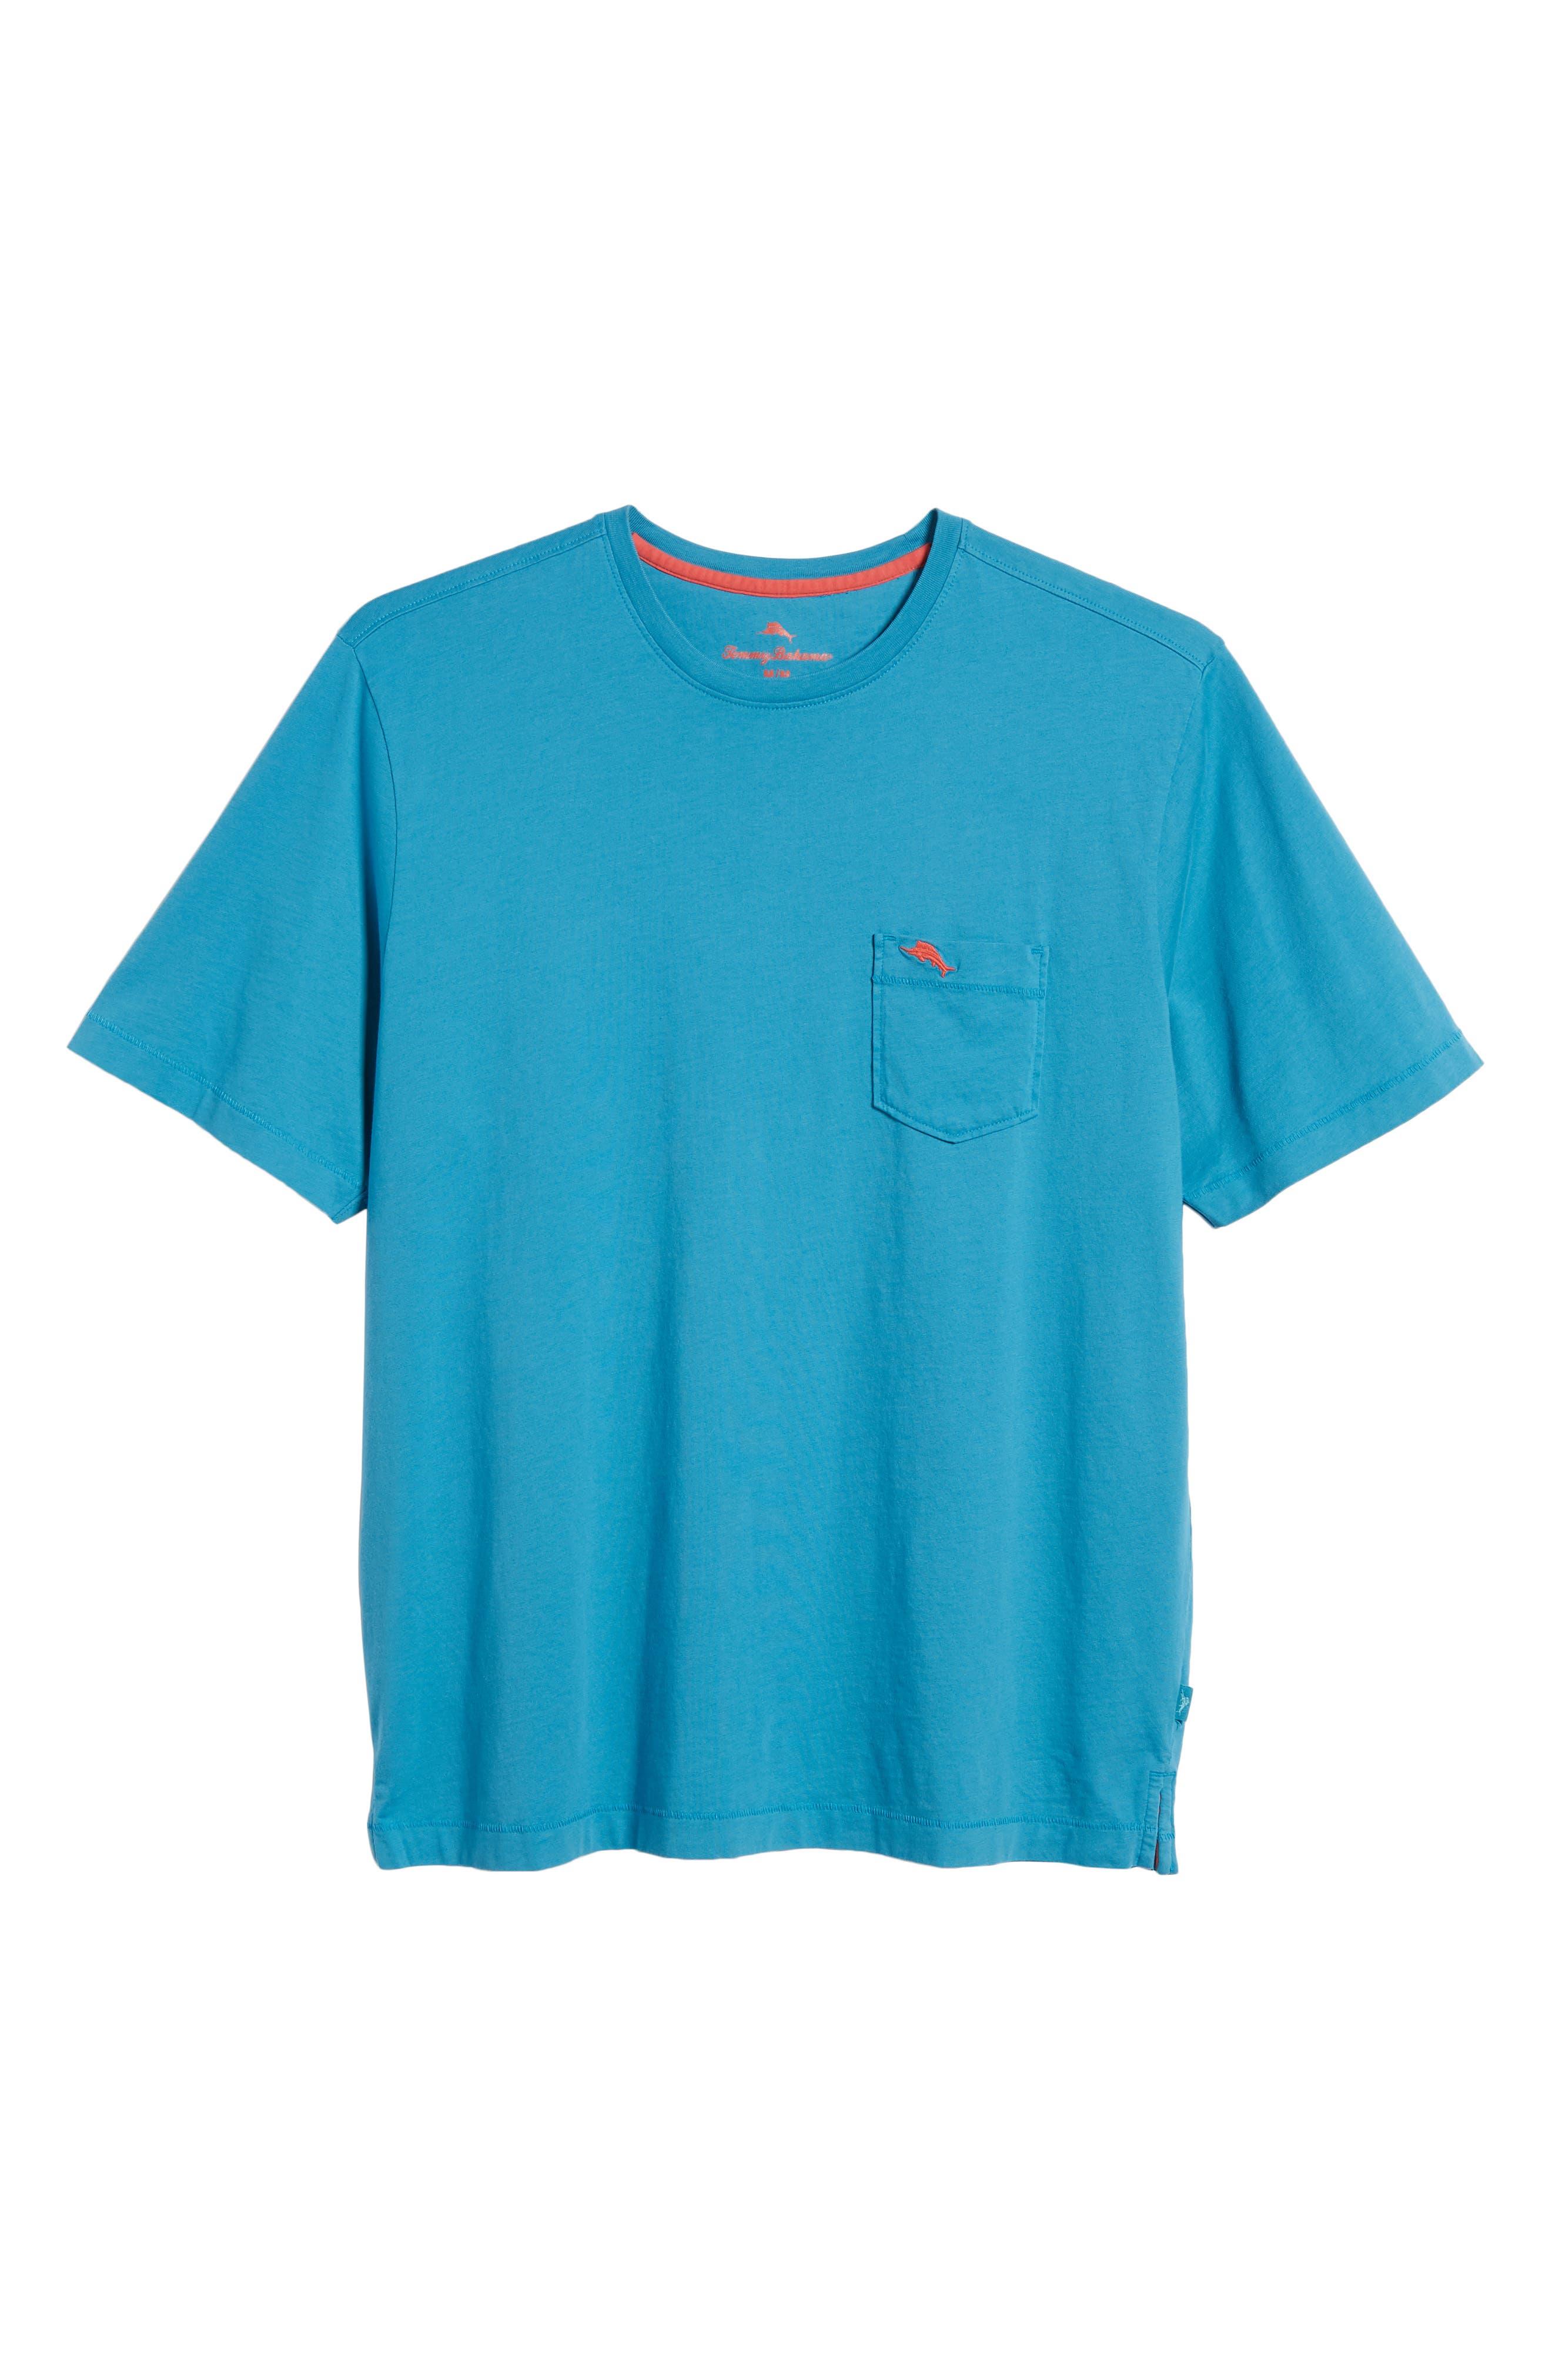 TOMMY BAHAMA,                             New Bali Sky Pima Cotton Pocket T-Shirt,                             Alternate thumbnail 6, color,                             410